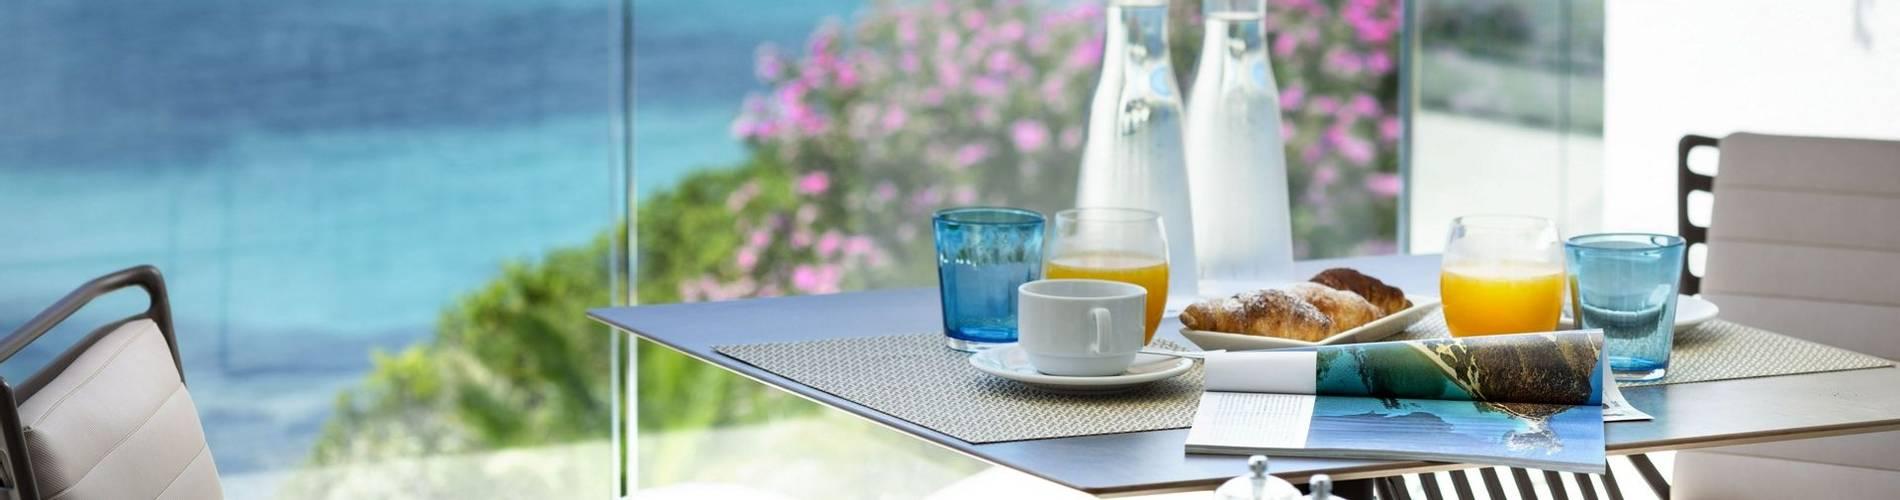 Pool Suite - Gabbiano Azzurro Hotel Sardinia6.jpg